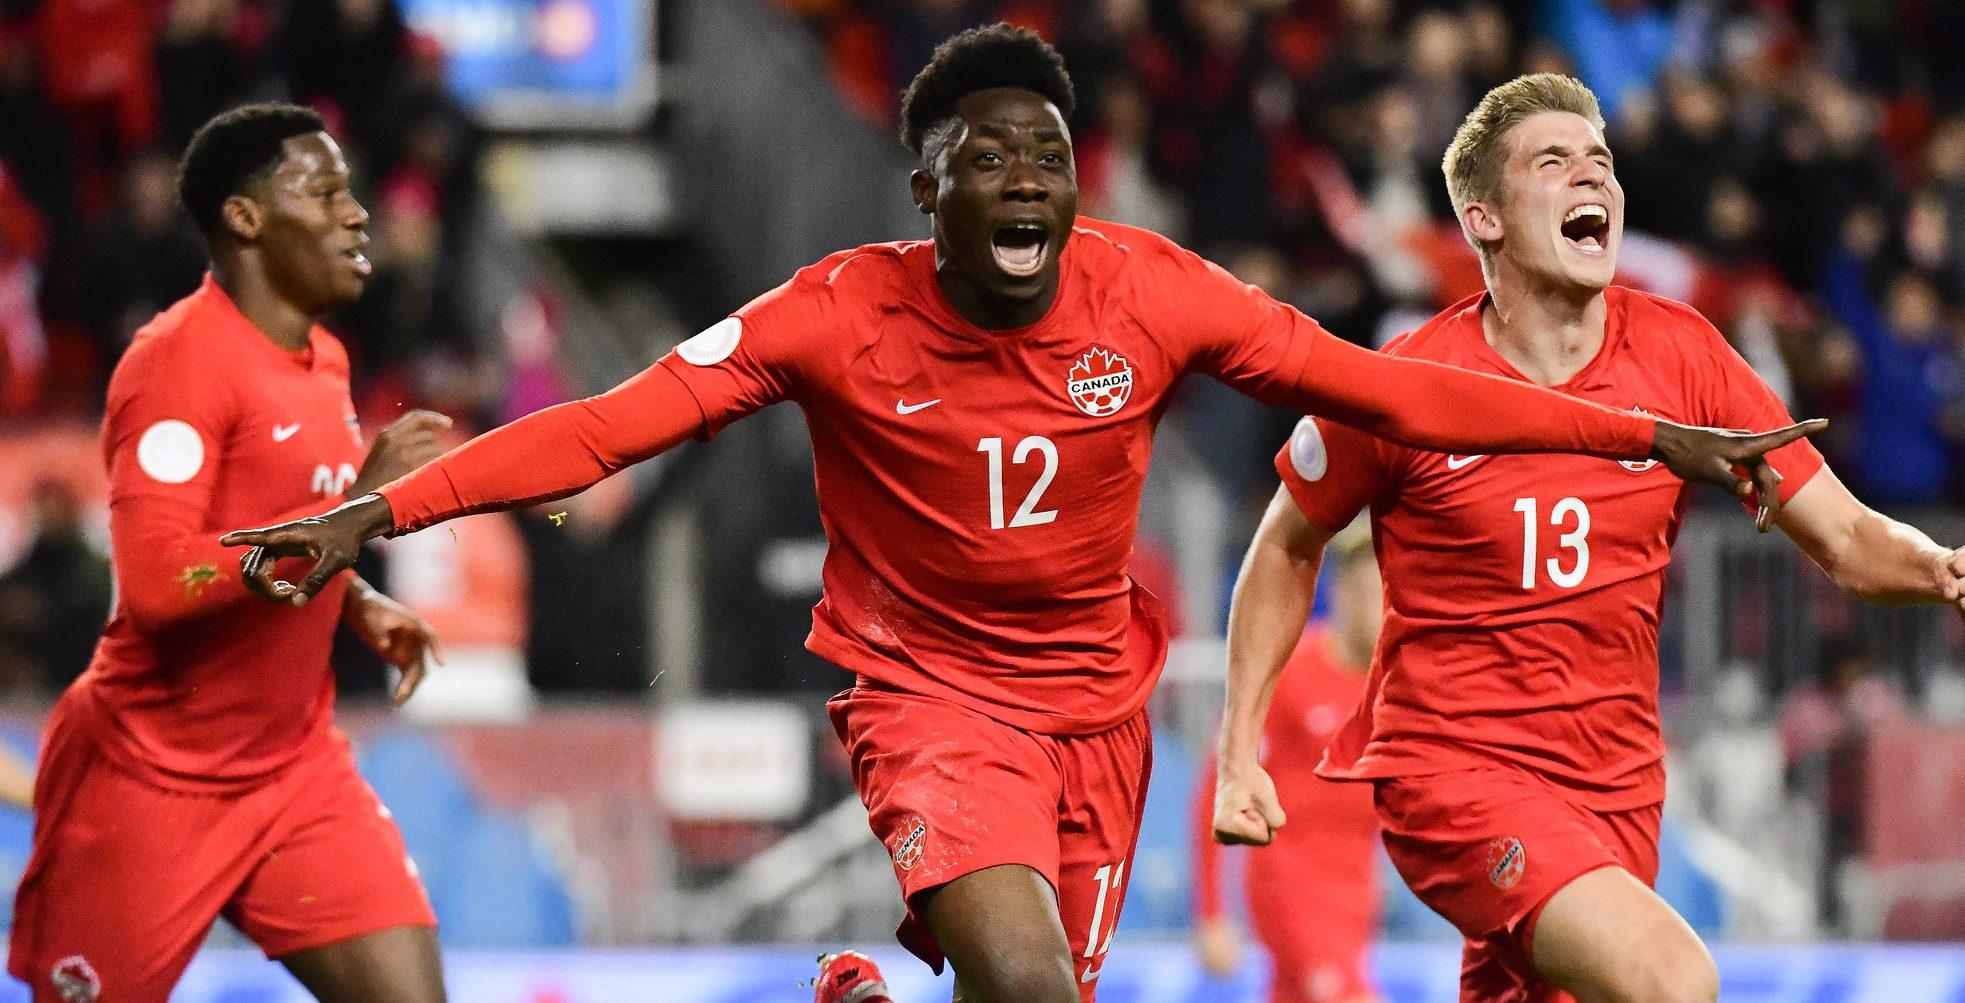 Be a kid, enjoy it': Alphonso Davies shines bright in historic U.S. win –  Canadian Premier League